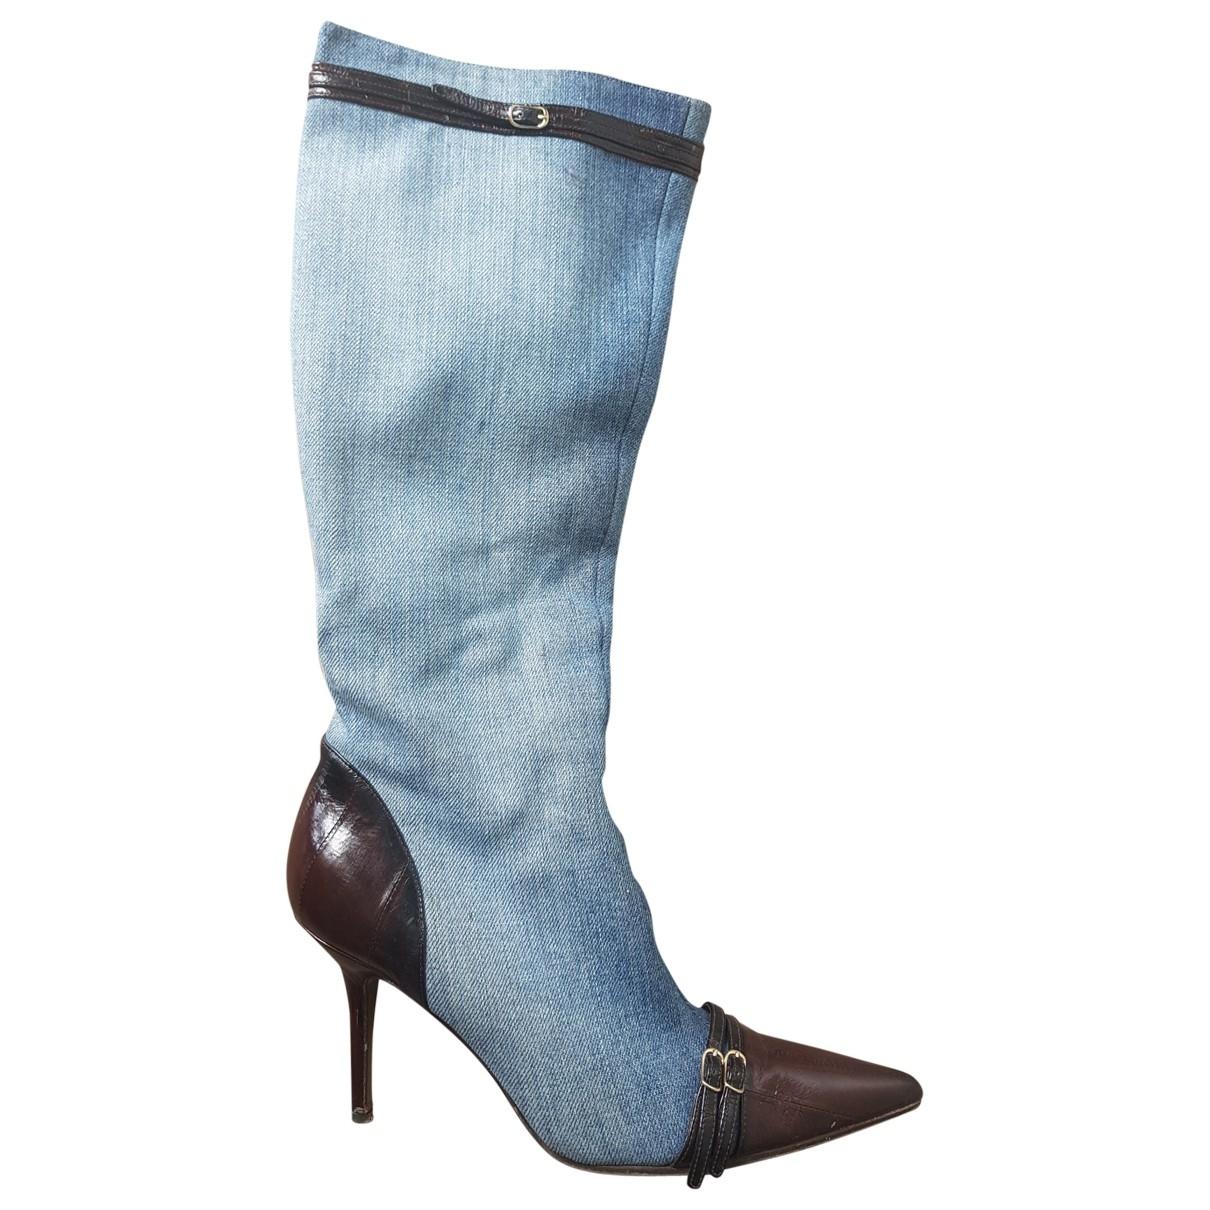 Botas de Lona Dolce & Gabbana